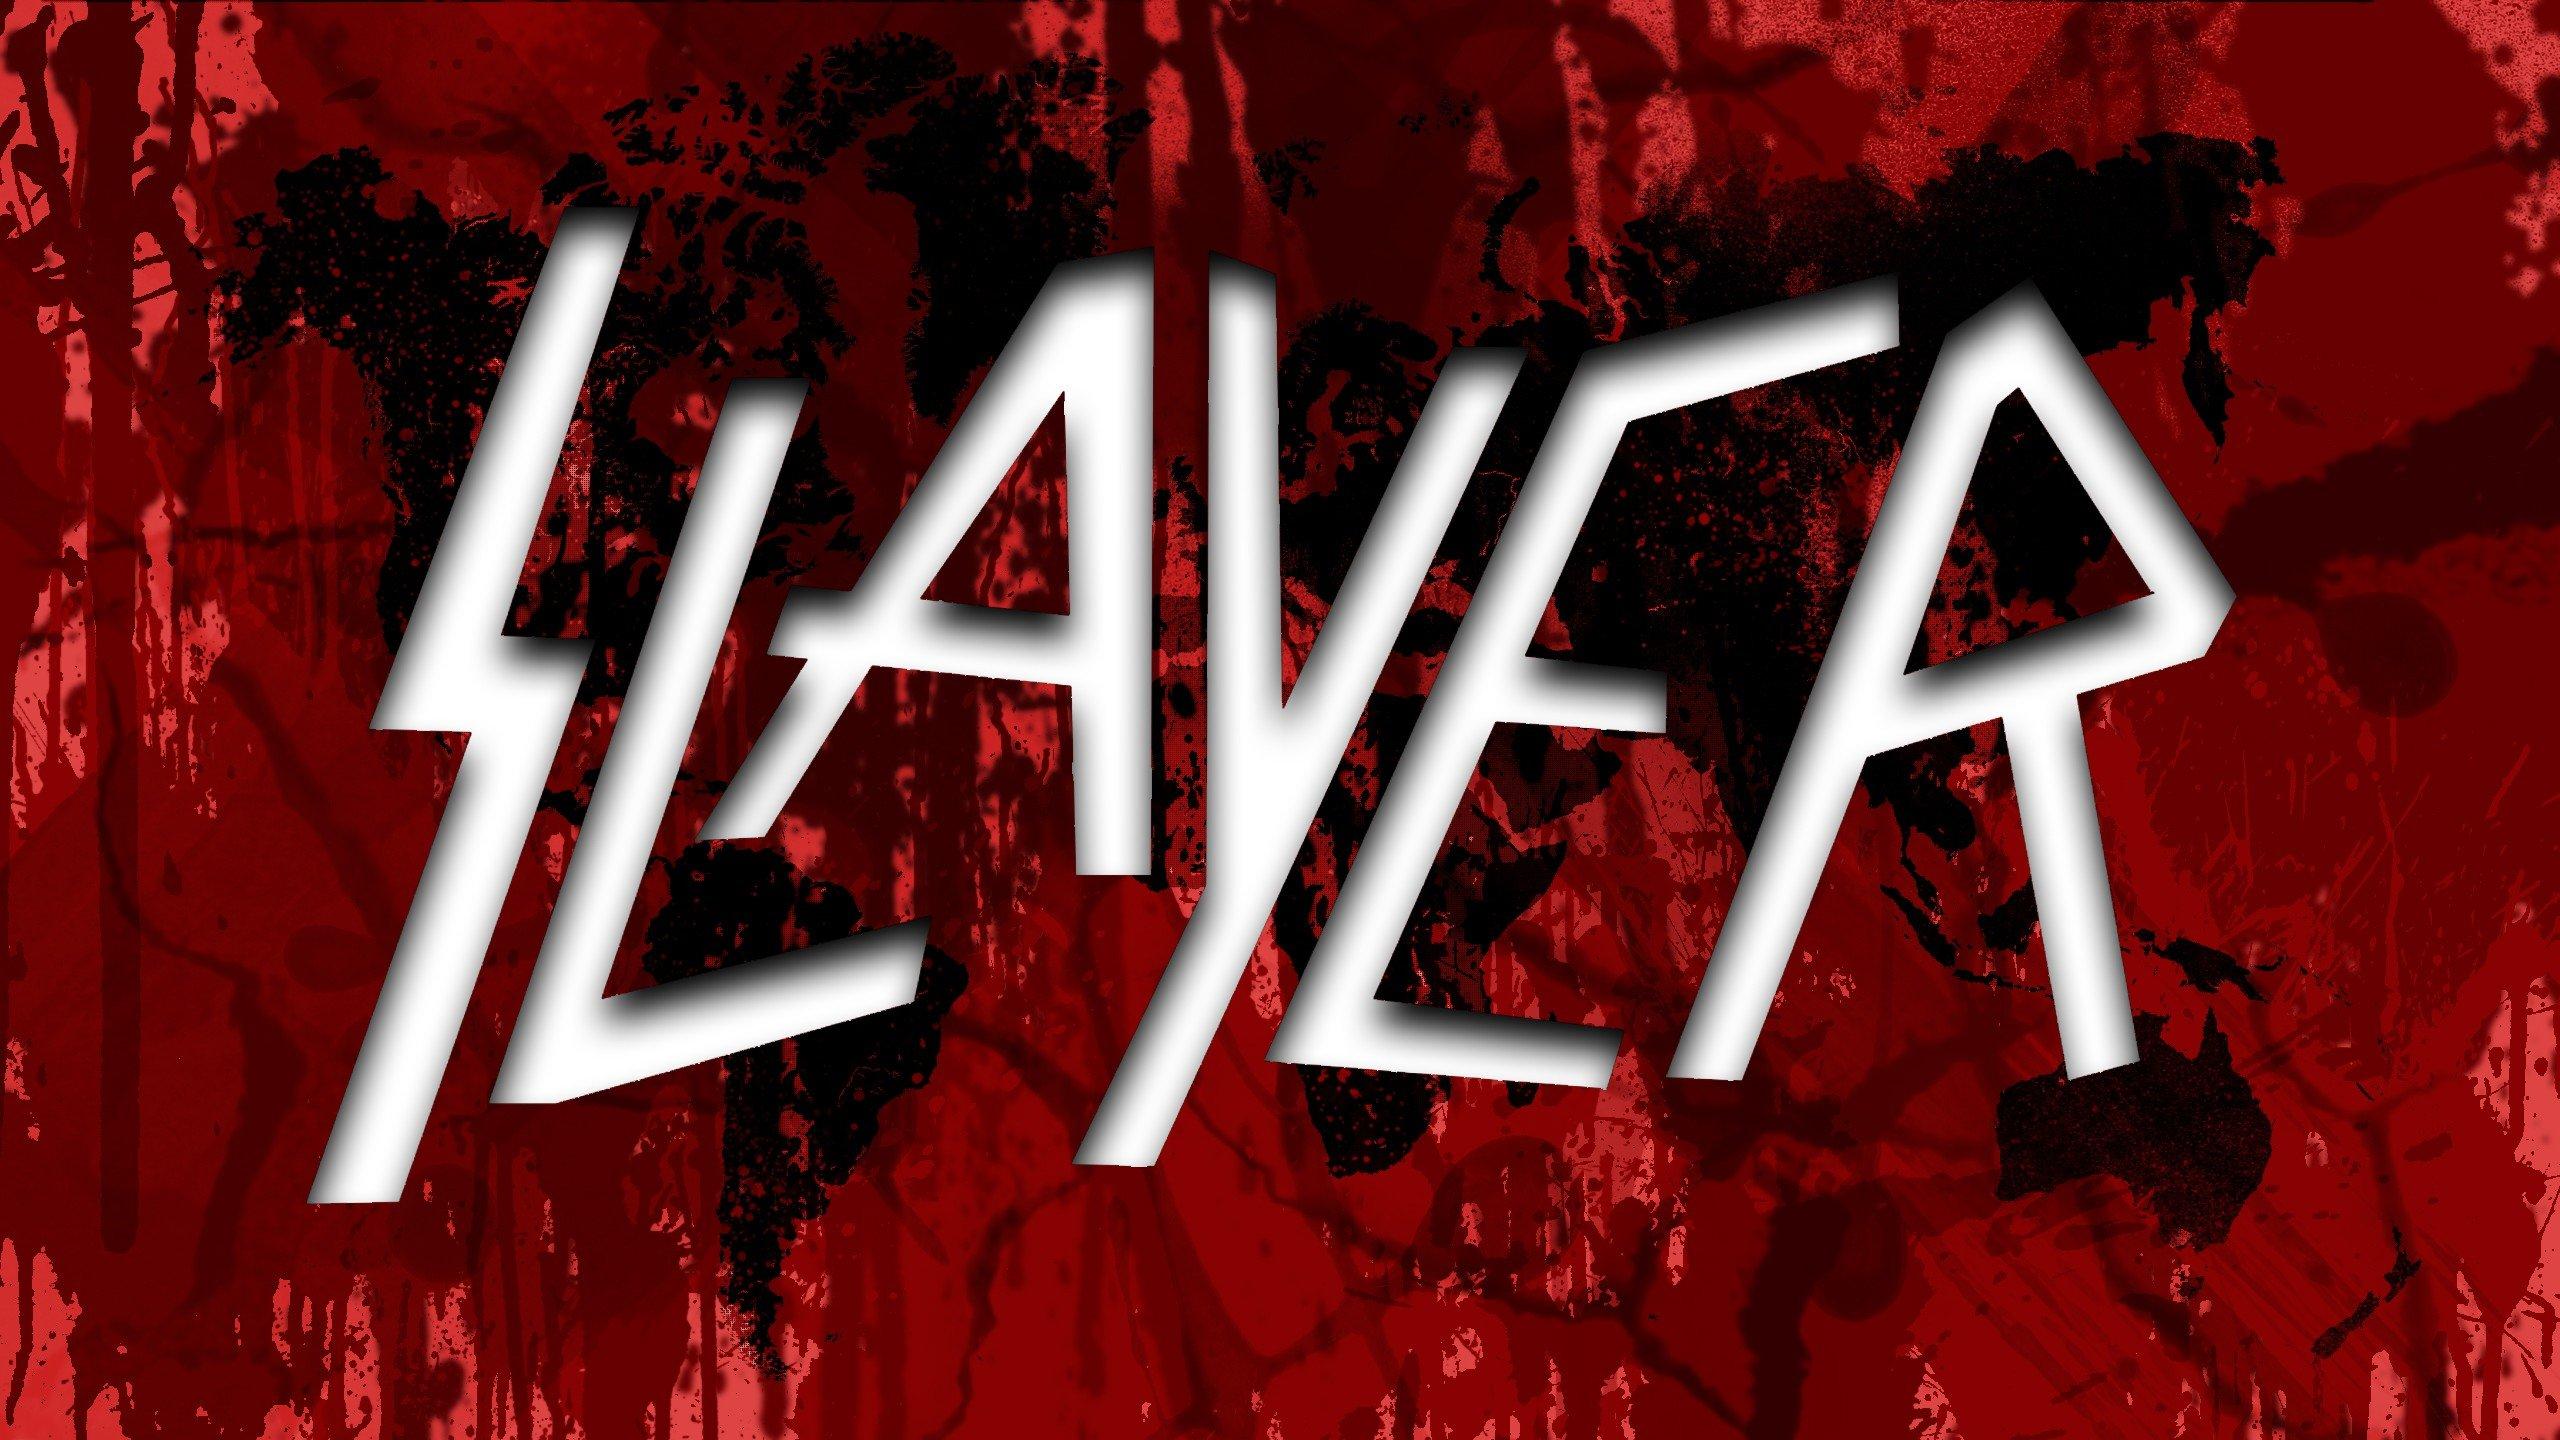 Slayer world map Thrash Metal TagNotAllowedTooSubjective splatters Red 2560x1440